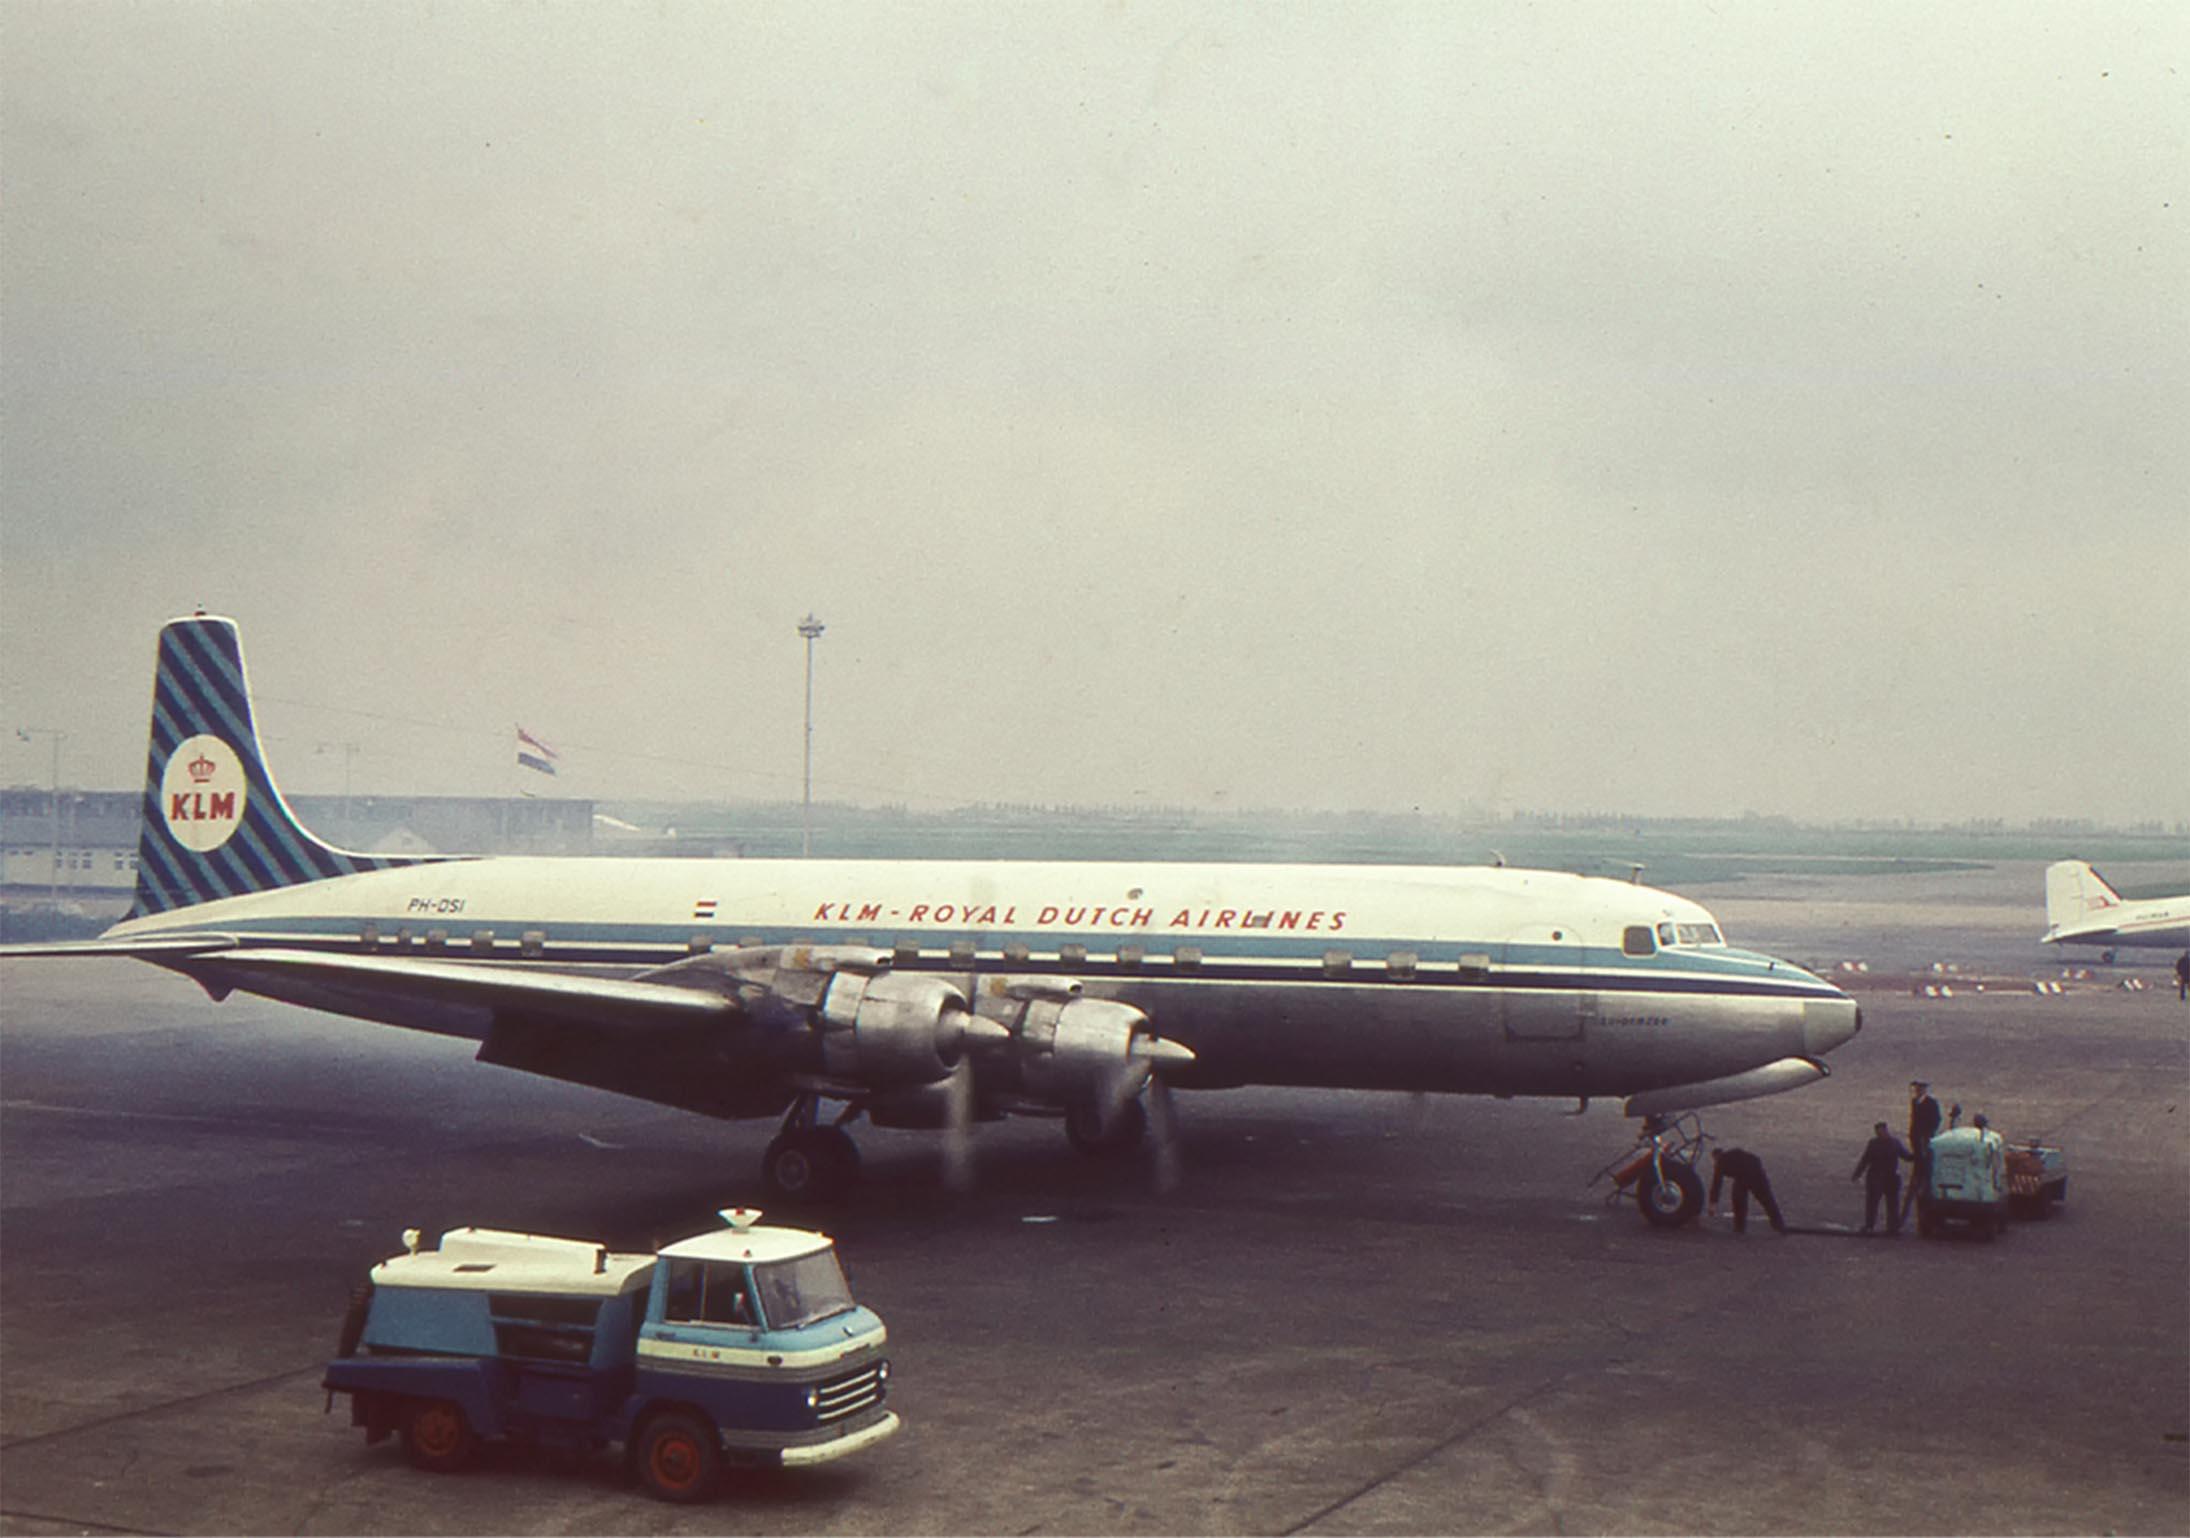 KLM Royal Dutch Airlines plane